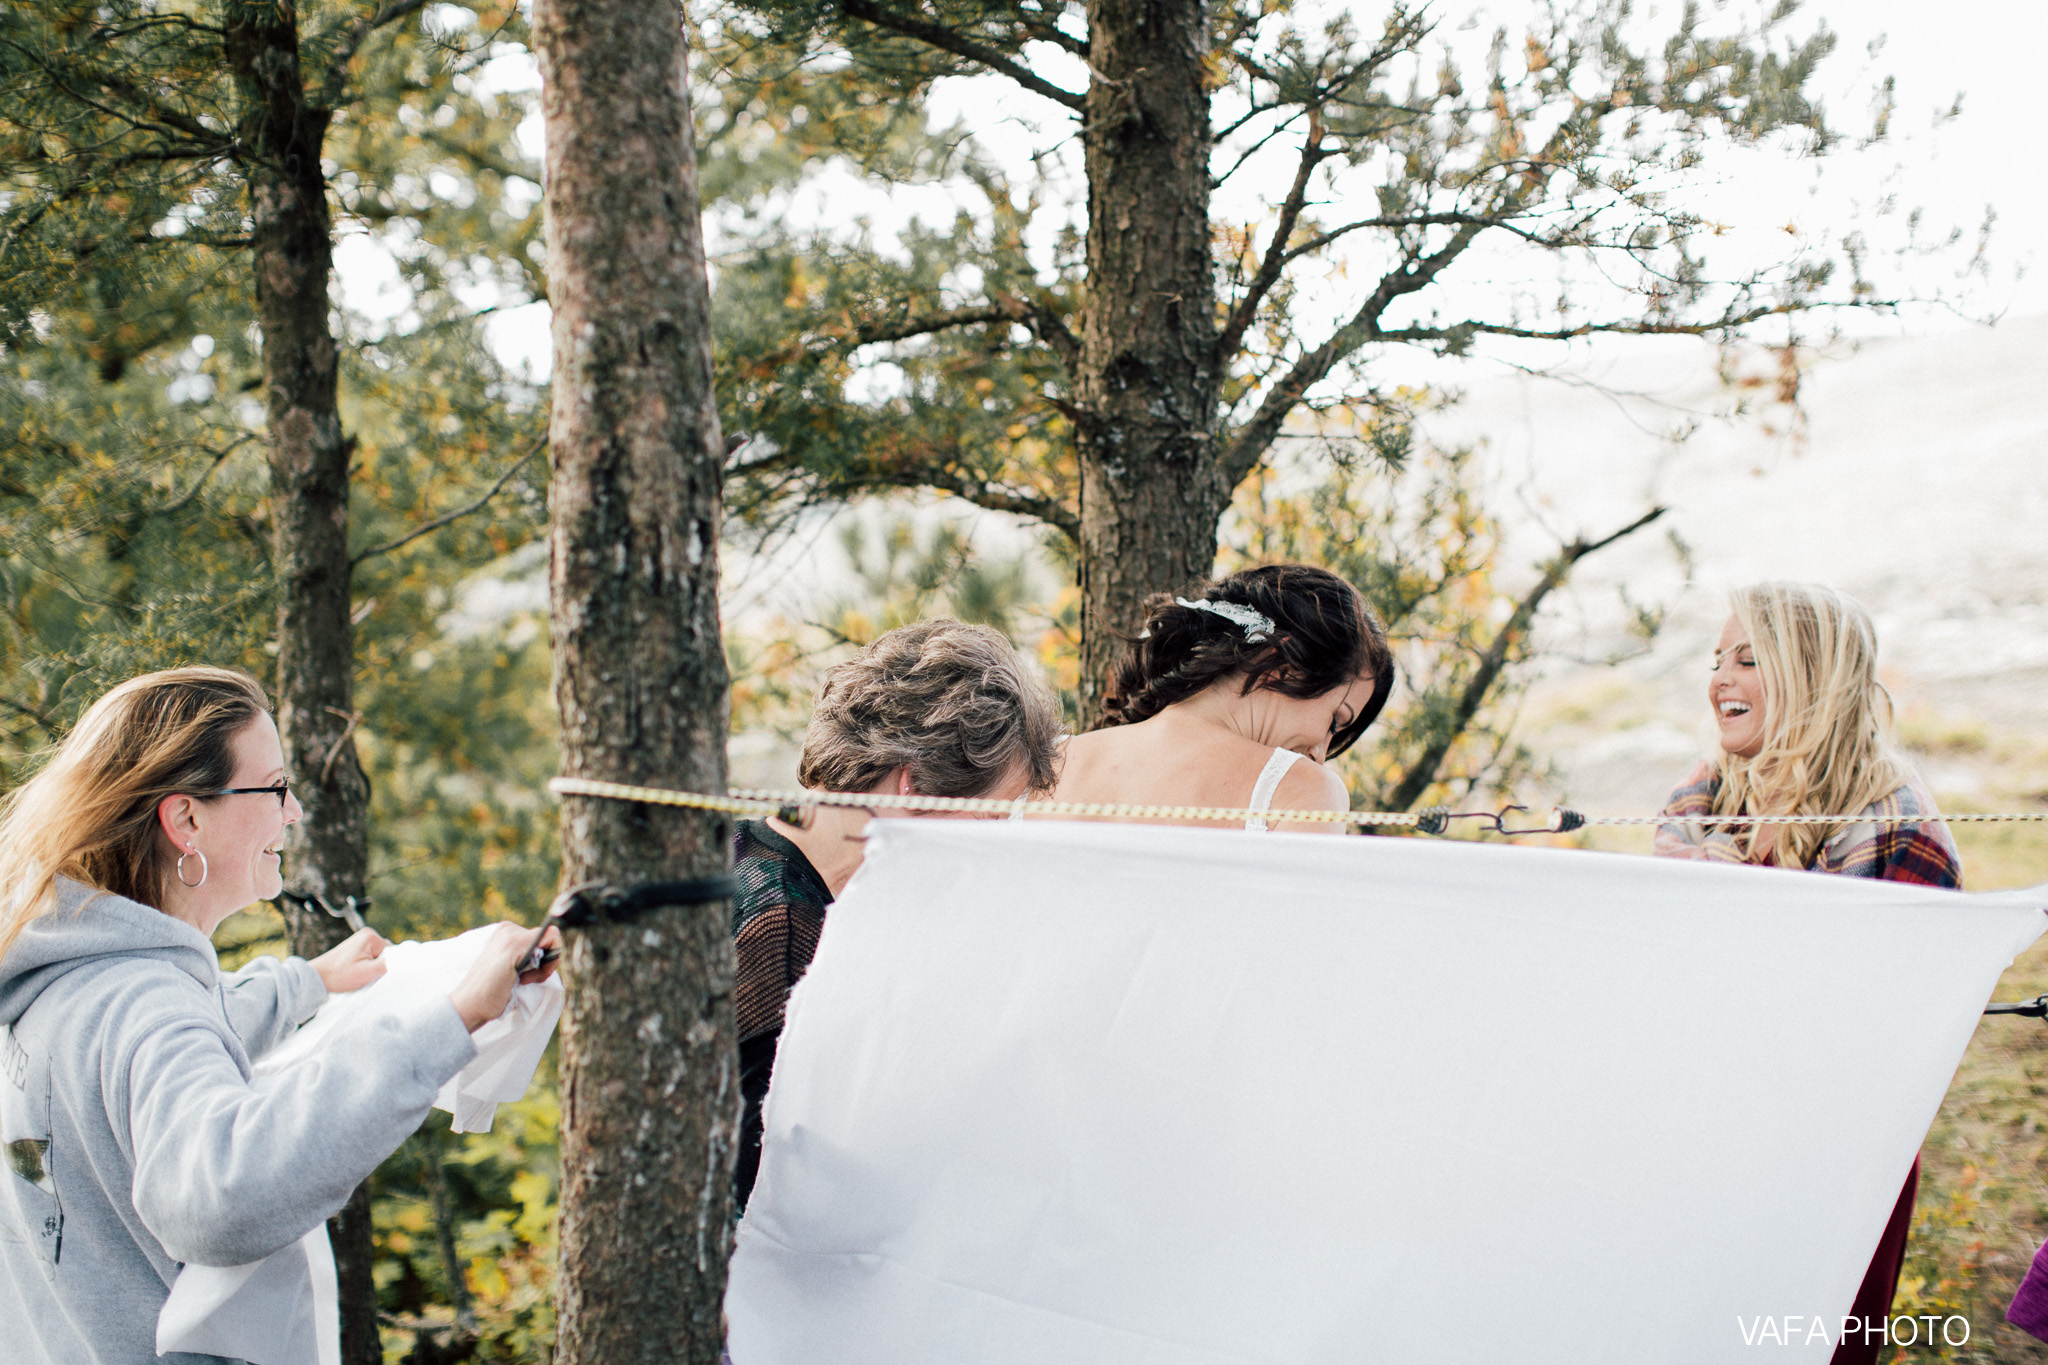 Hogback-Mountain-Wedding-Chelsea-Josh-Vafa-Photo-66.jpg